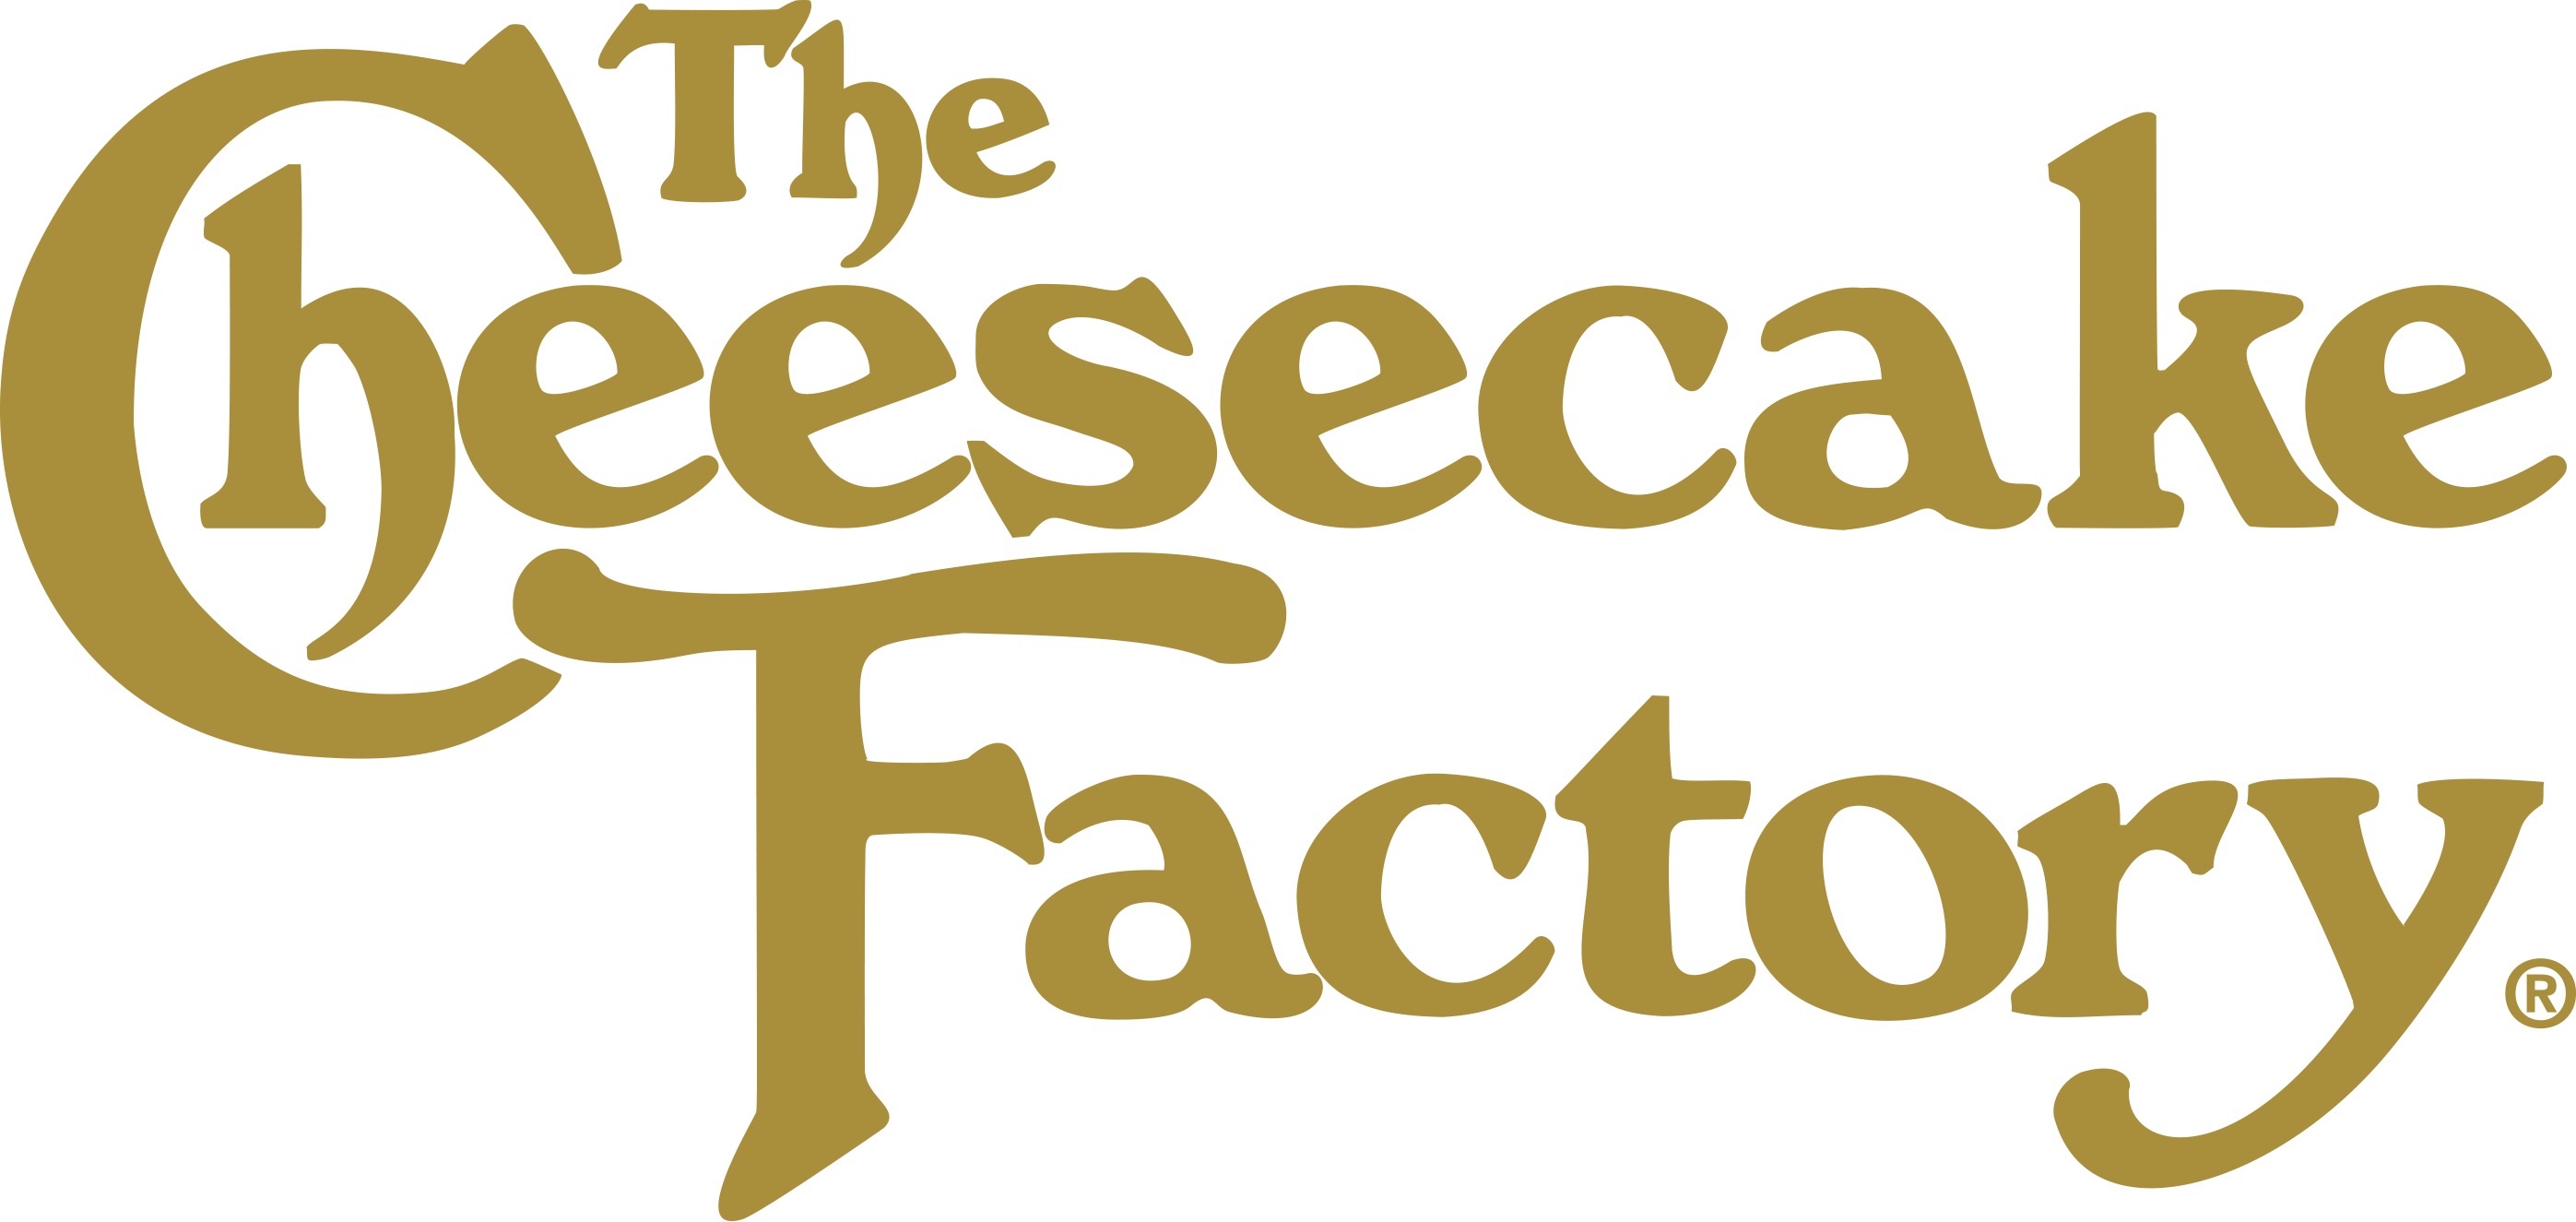 The Cheesecake Factory free birthday ice cream